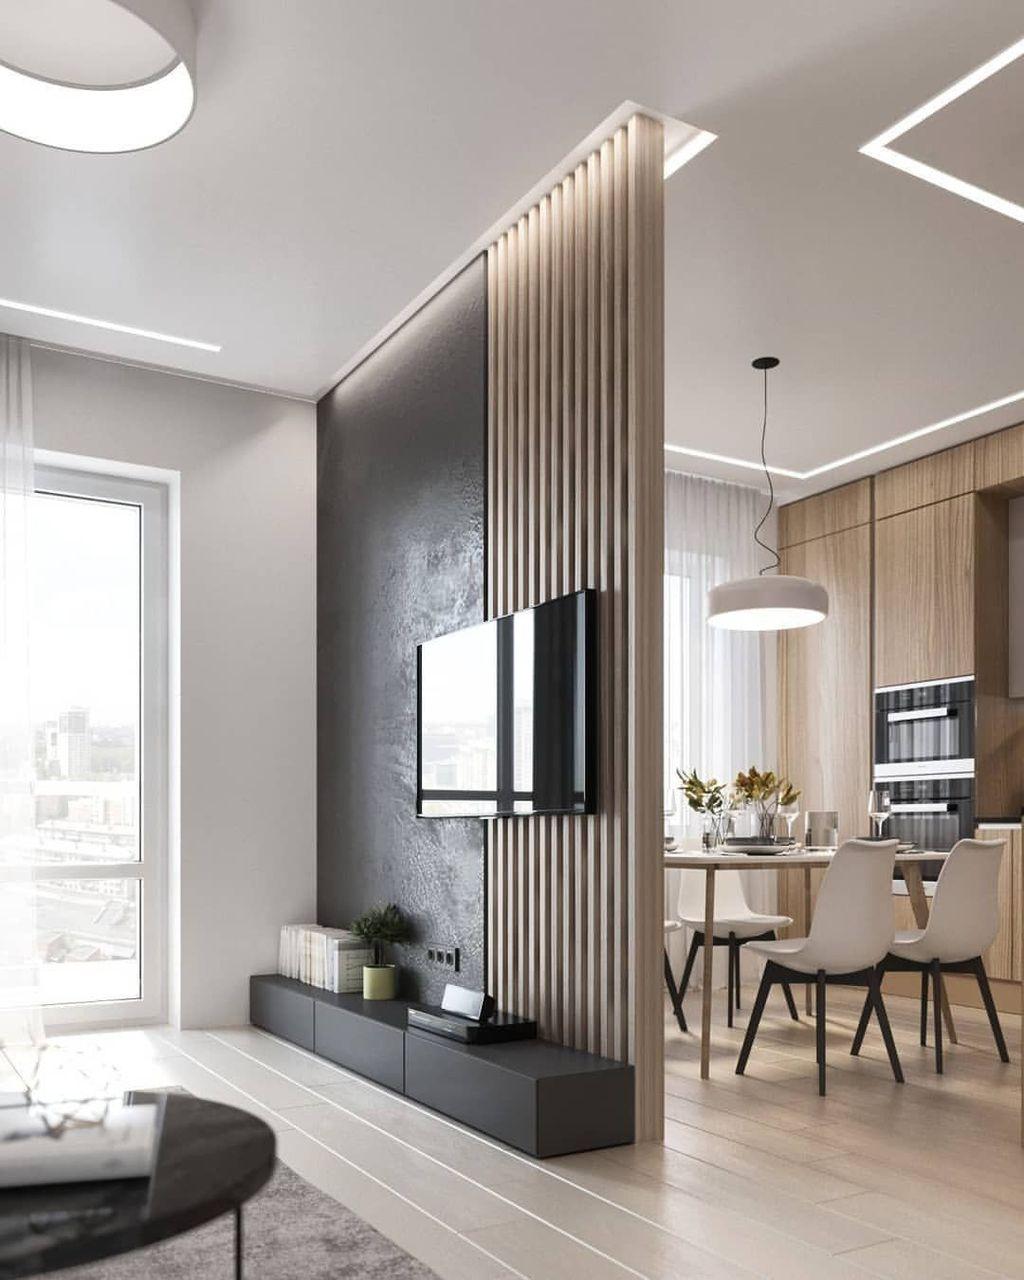 Admirable Modern Interior Design Ideas You Never Seen Before 16